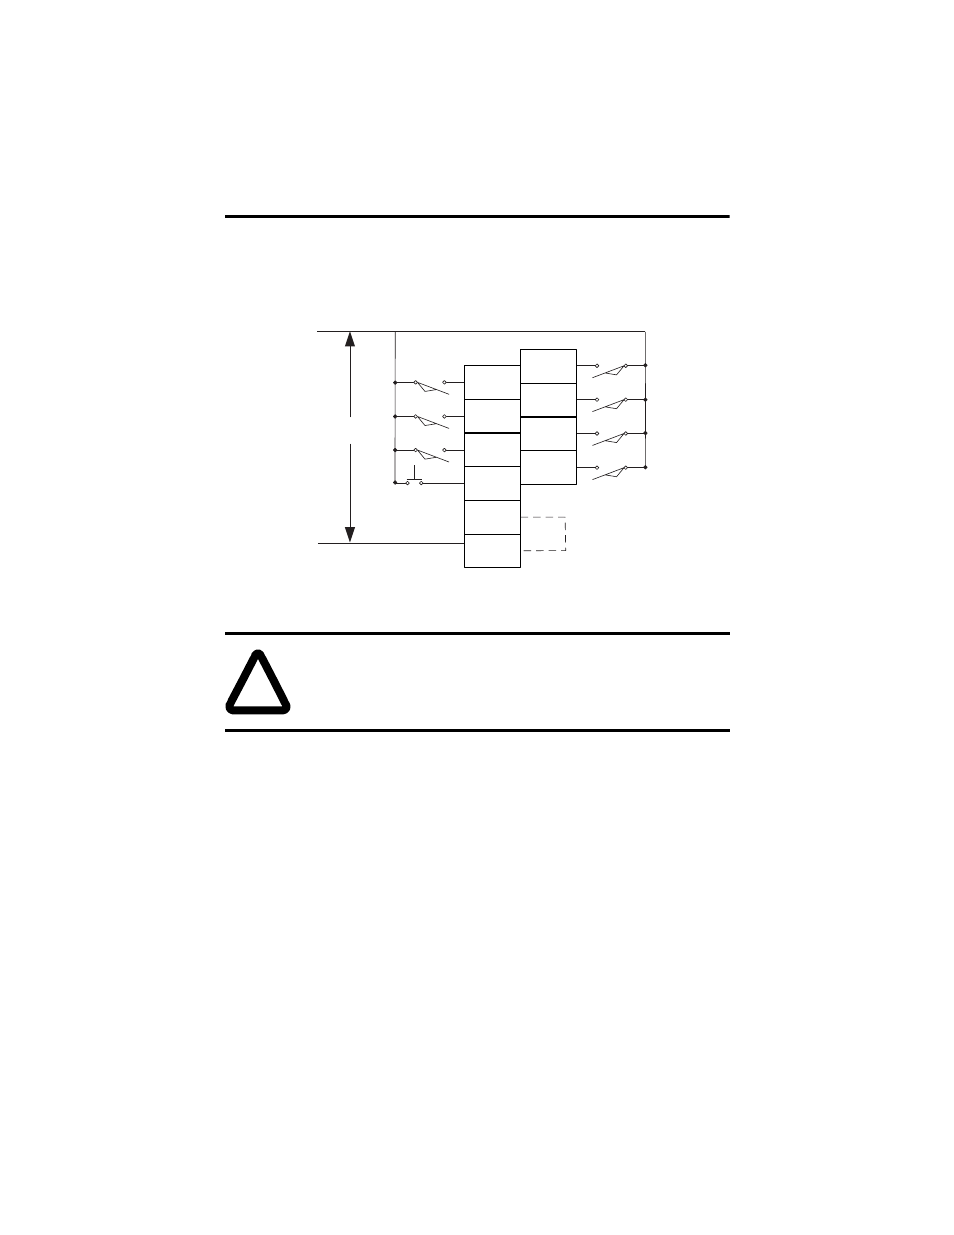 Input wiring   Rockwell Automation 1762-IA8 MICROLOGIX 120